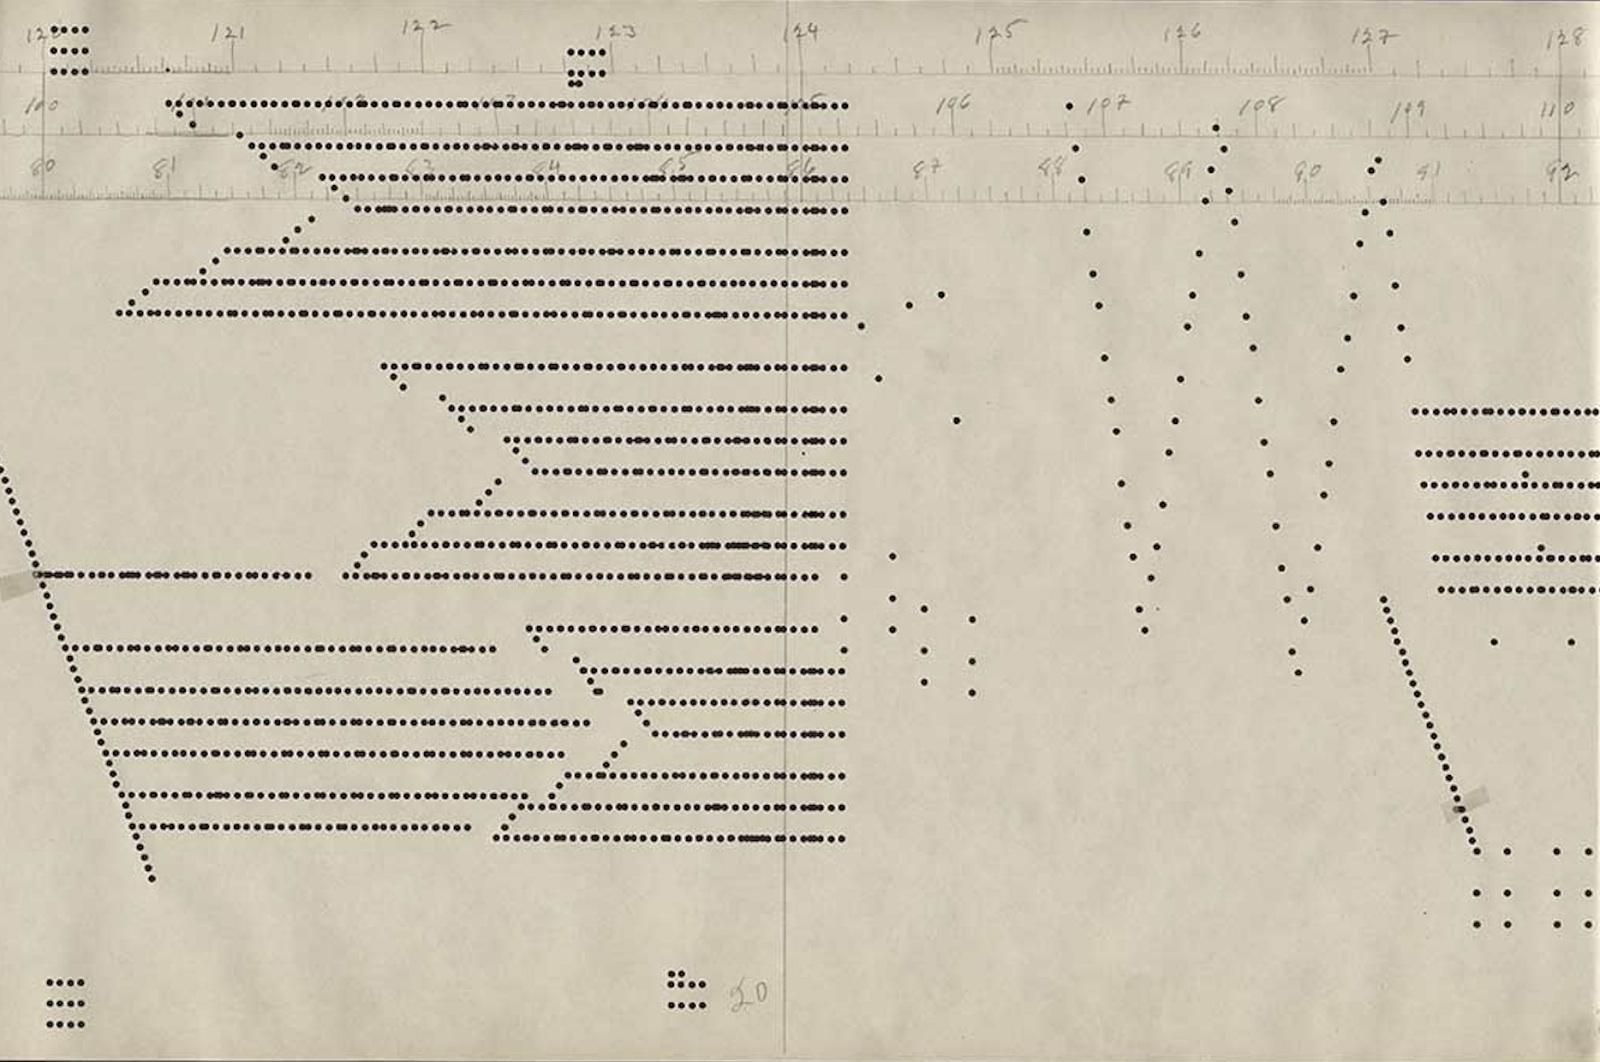 A detail of one of Conlon Nancarrow's piano rolls